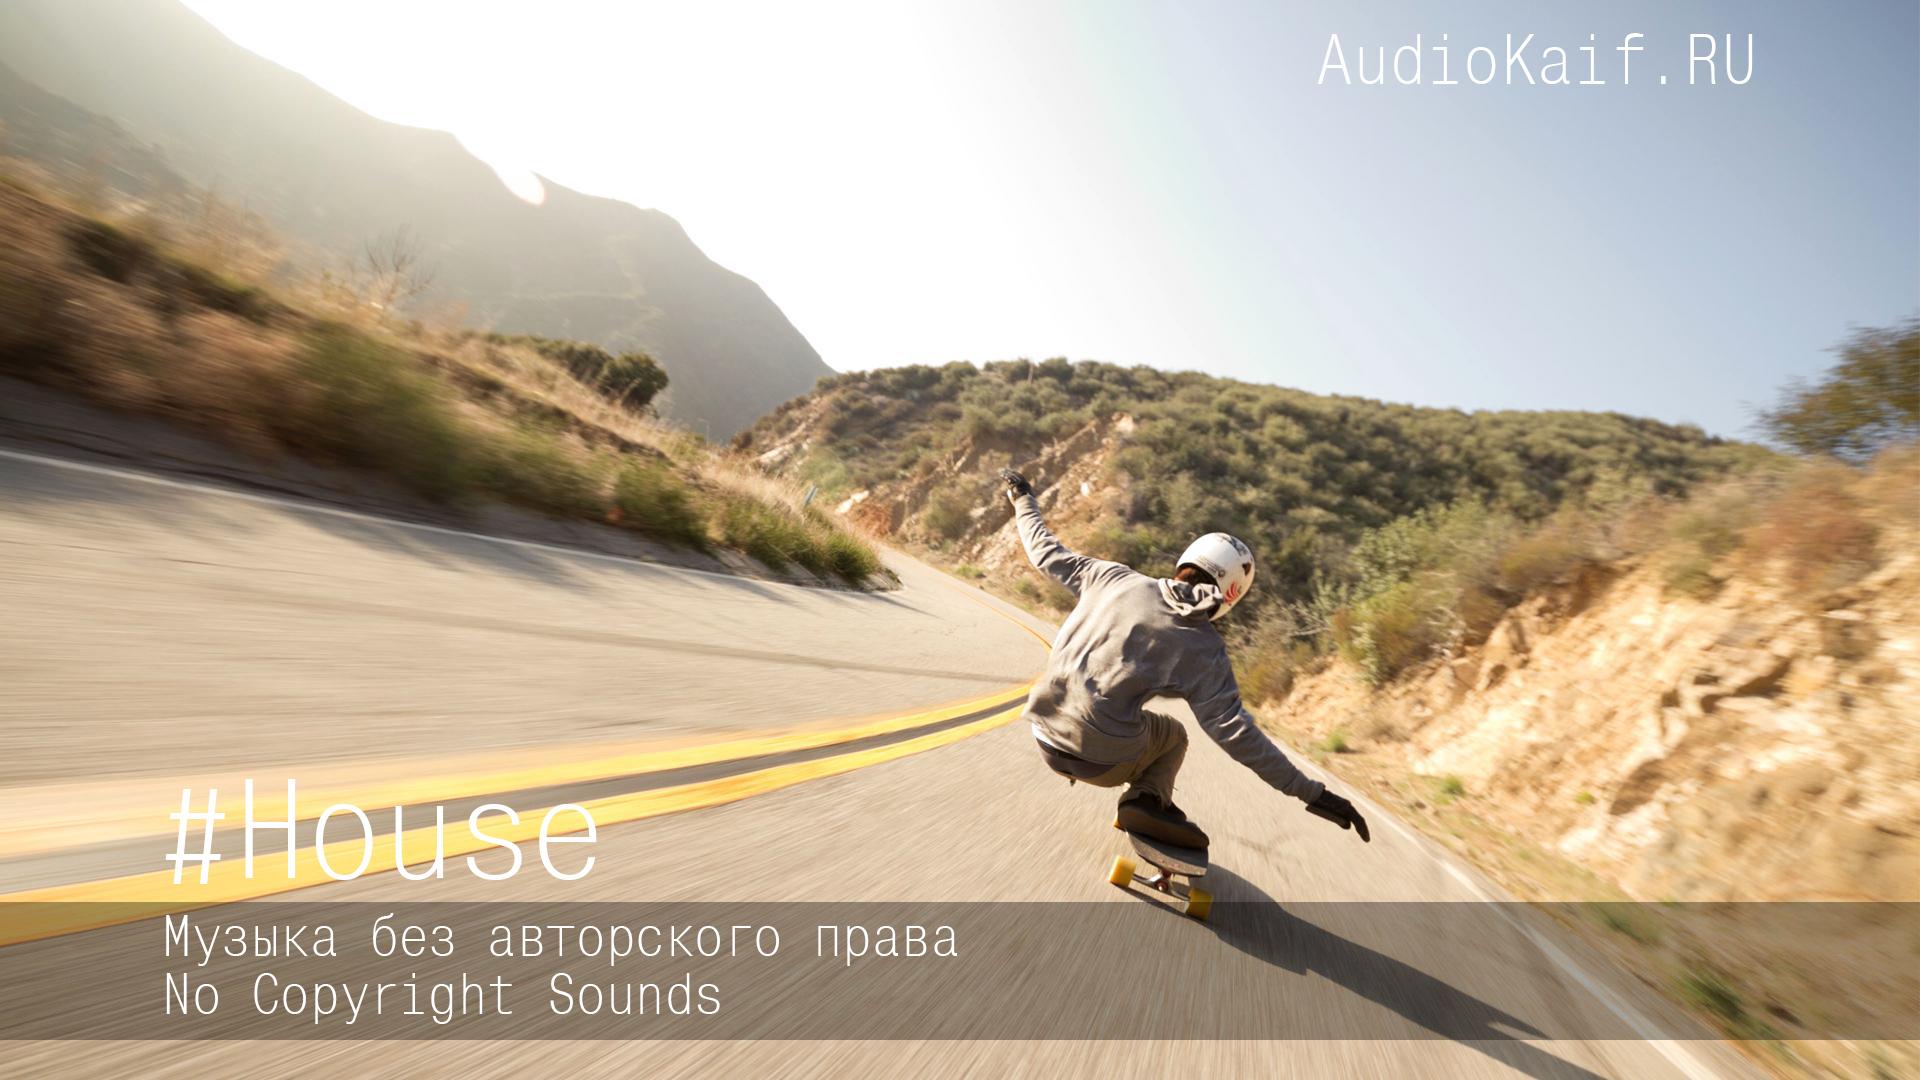 Музыка без авторского права / Jim Yosef Canary / House / AudioKaif RU / ютуб видео